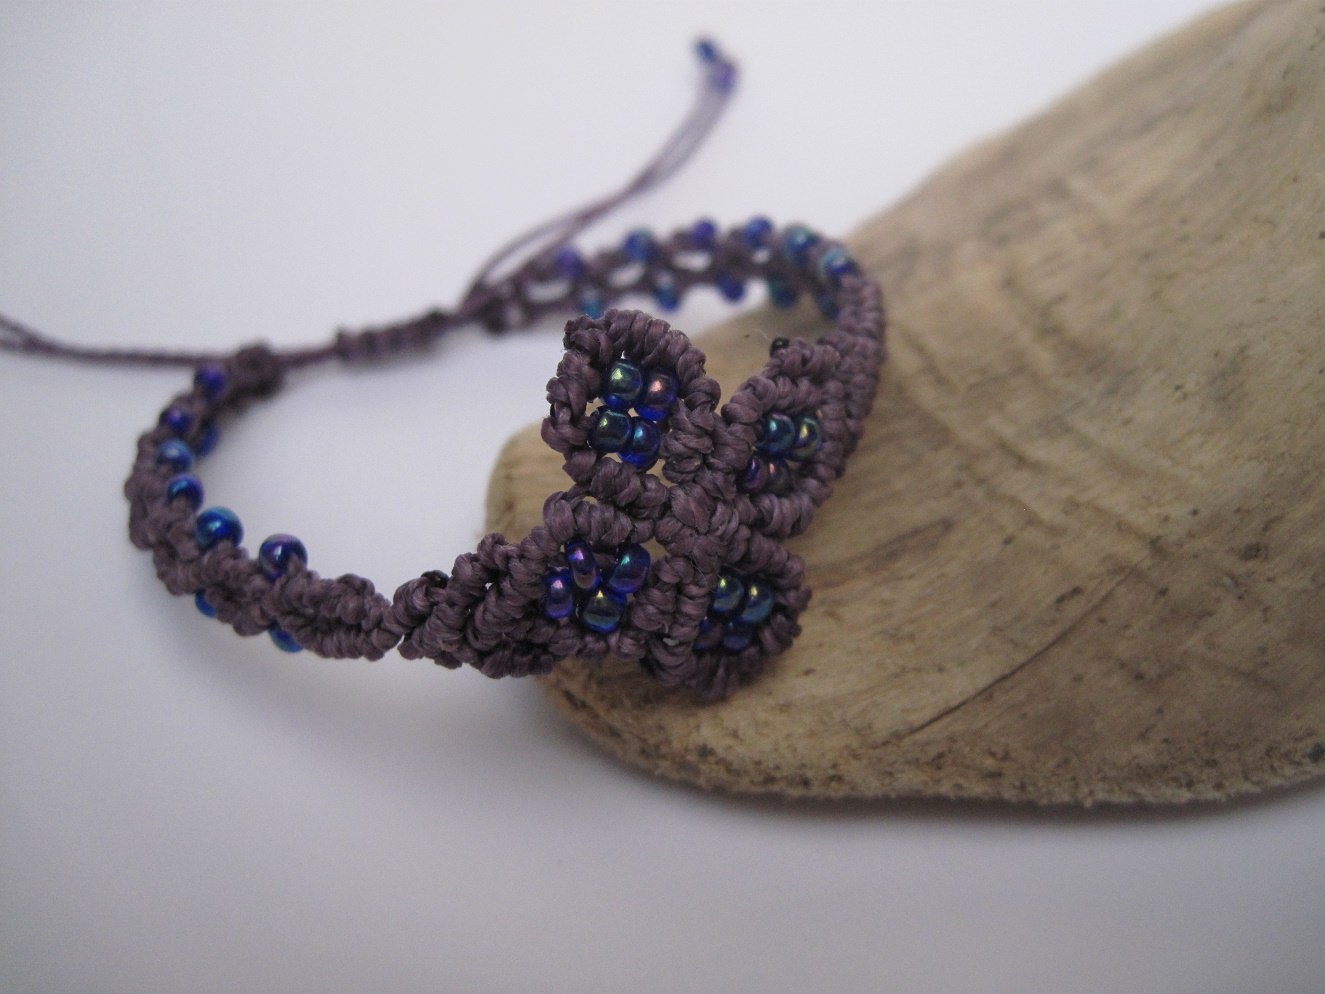 Kleinesbild - zartes Macrame Armband Floral, Macrameschmuck, micro Macrame